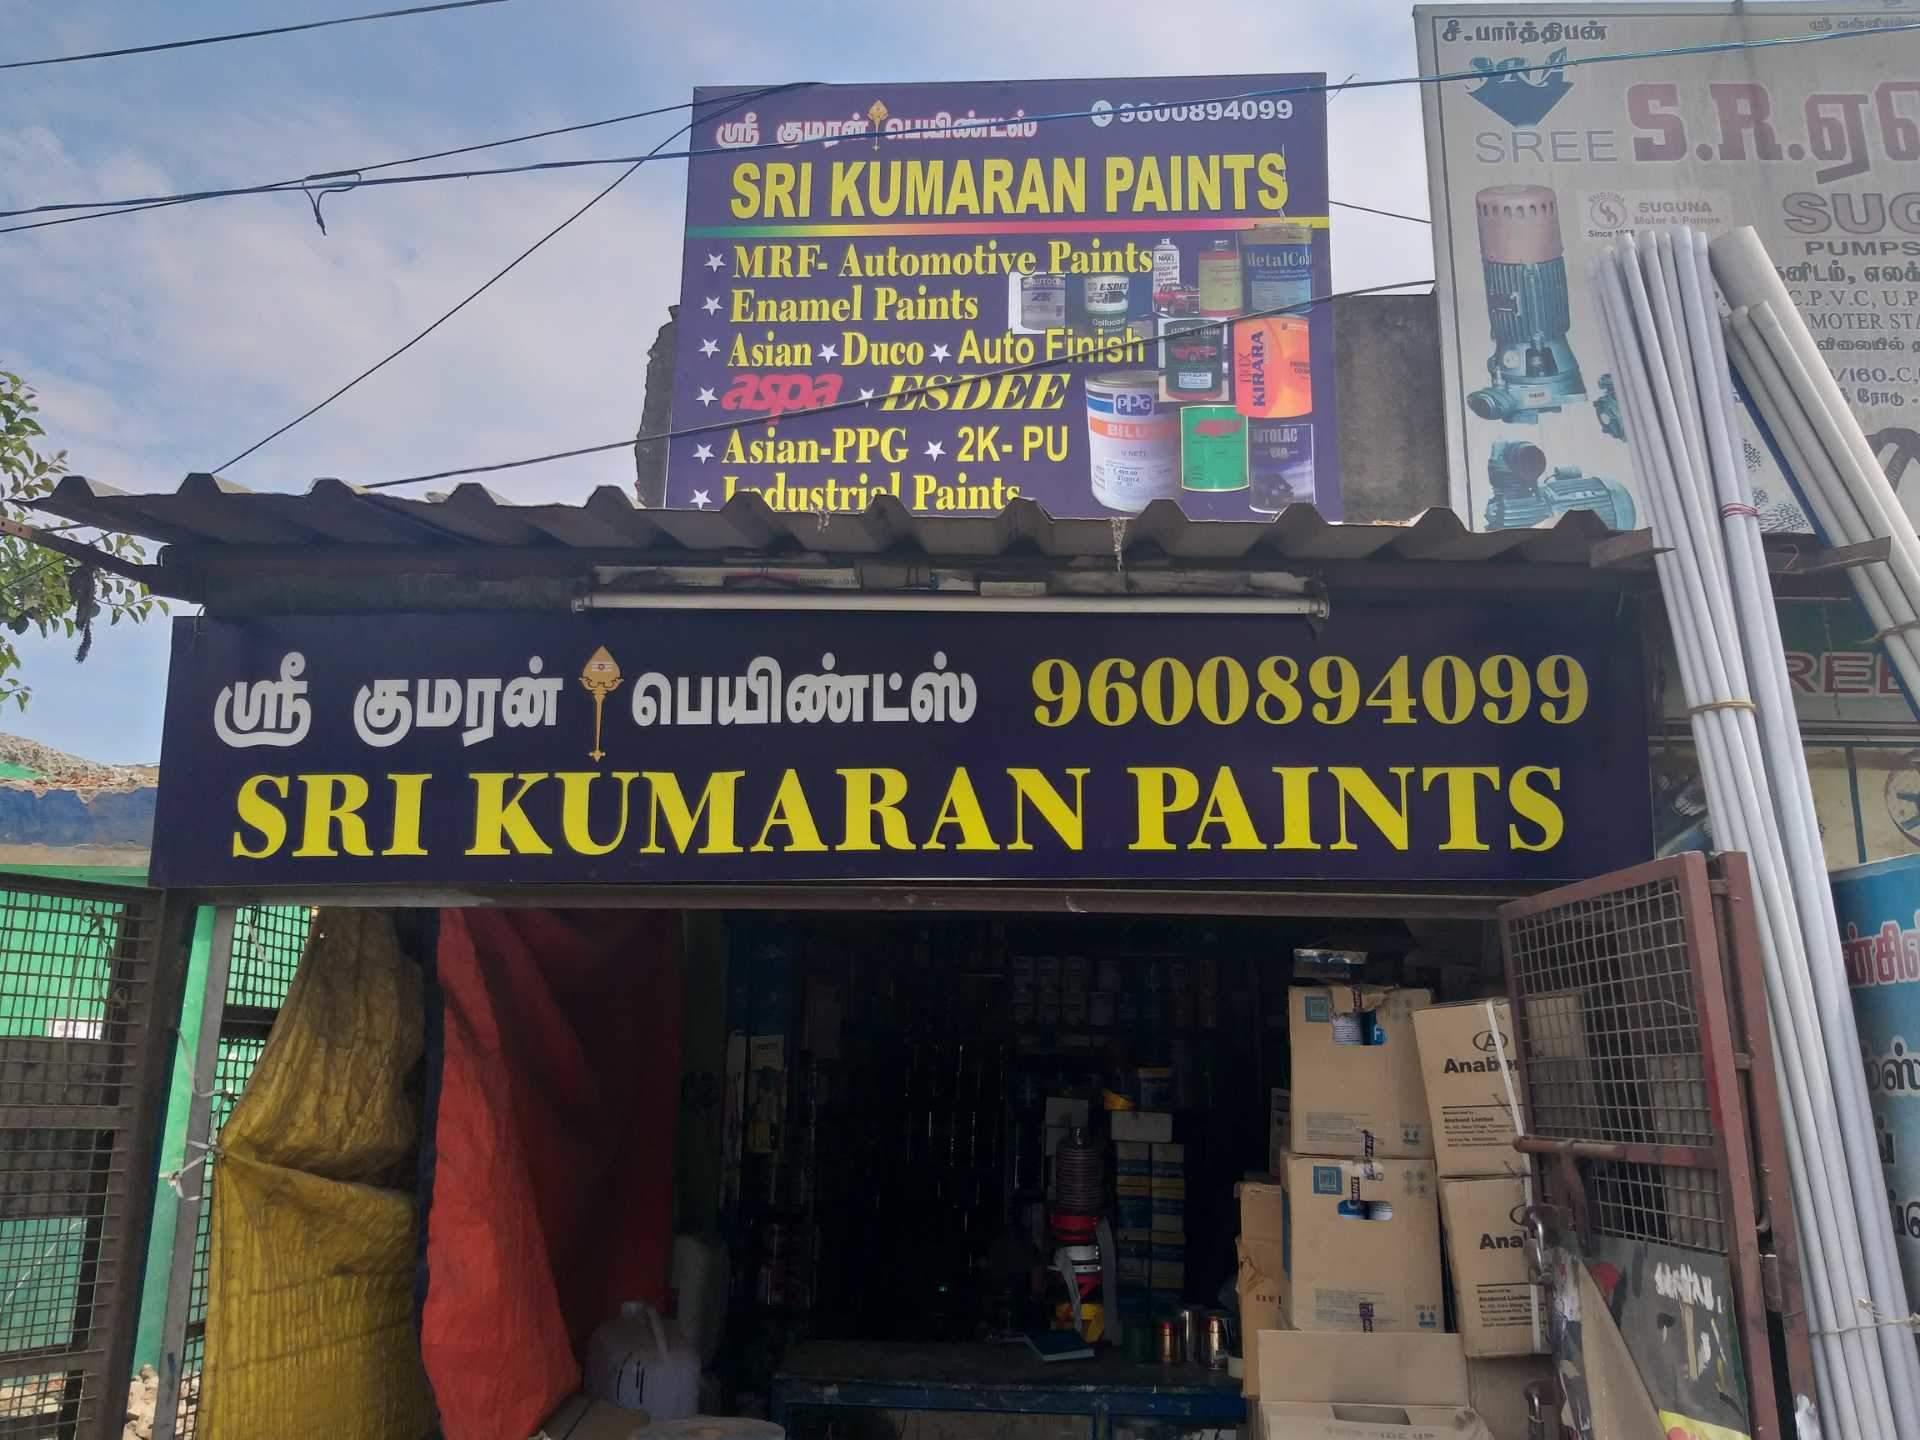 Top 10 Ppg Automotive Paint Dealers in Kodambakkam - Best